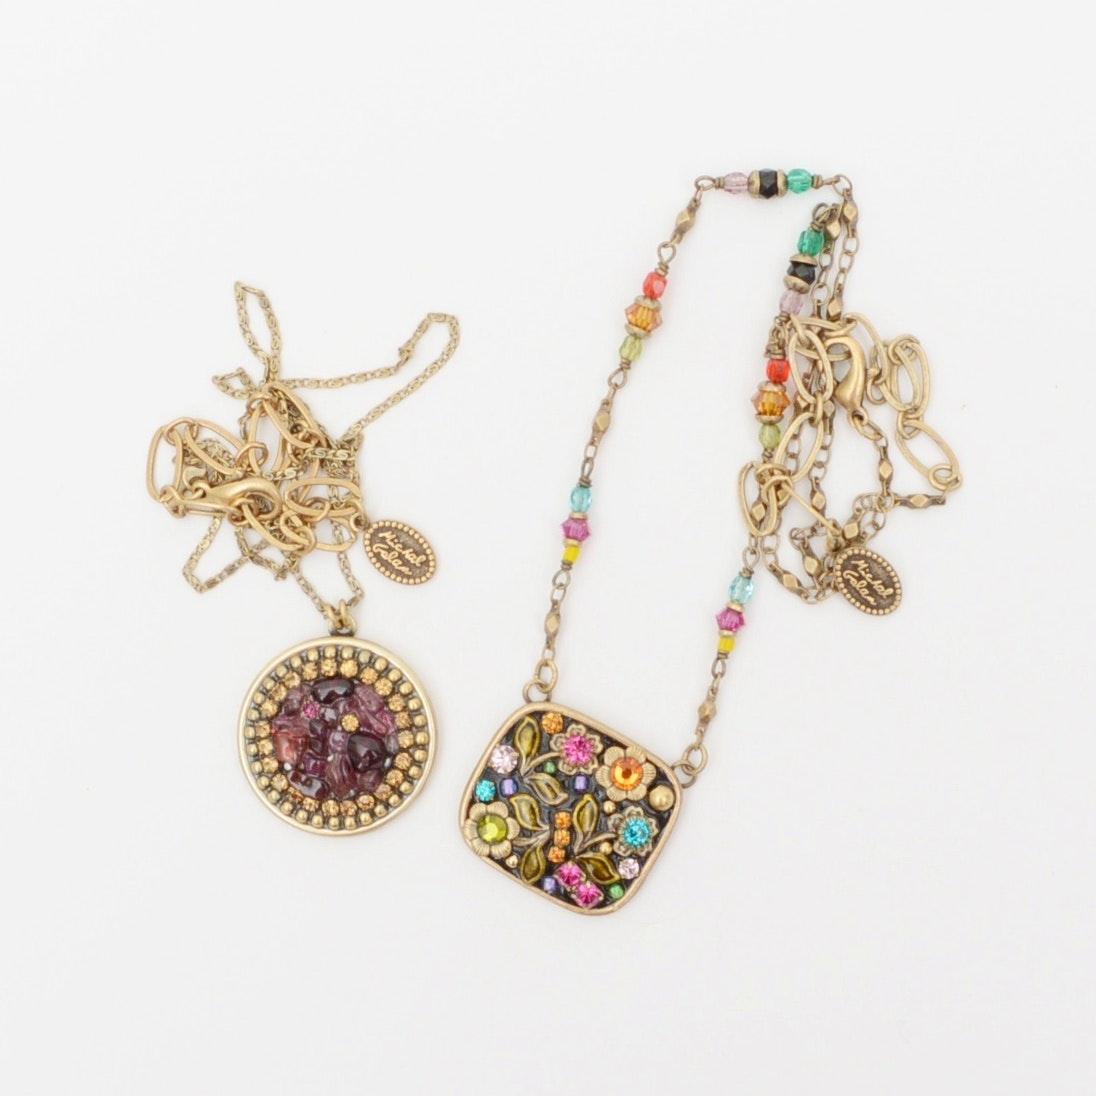 Pair of Vintage Michal Golan Necklaces